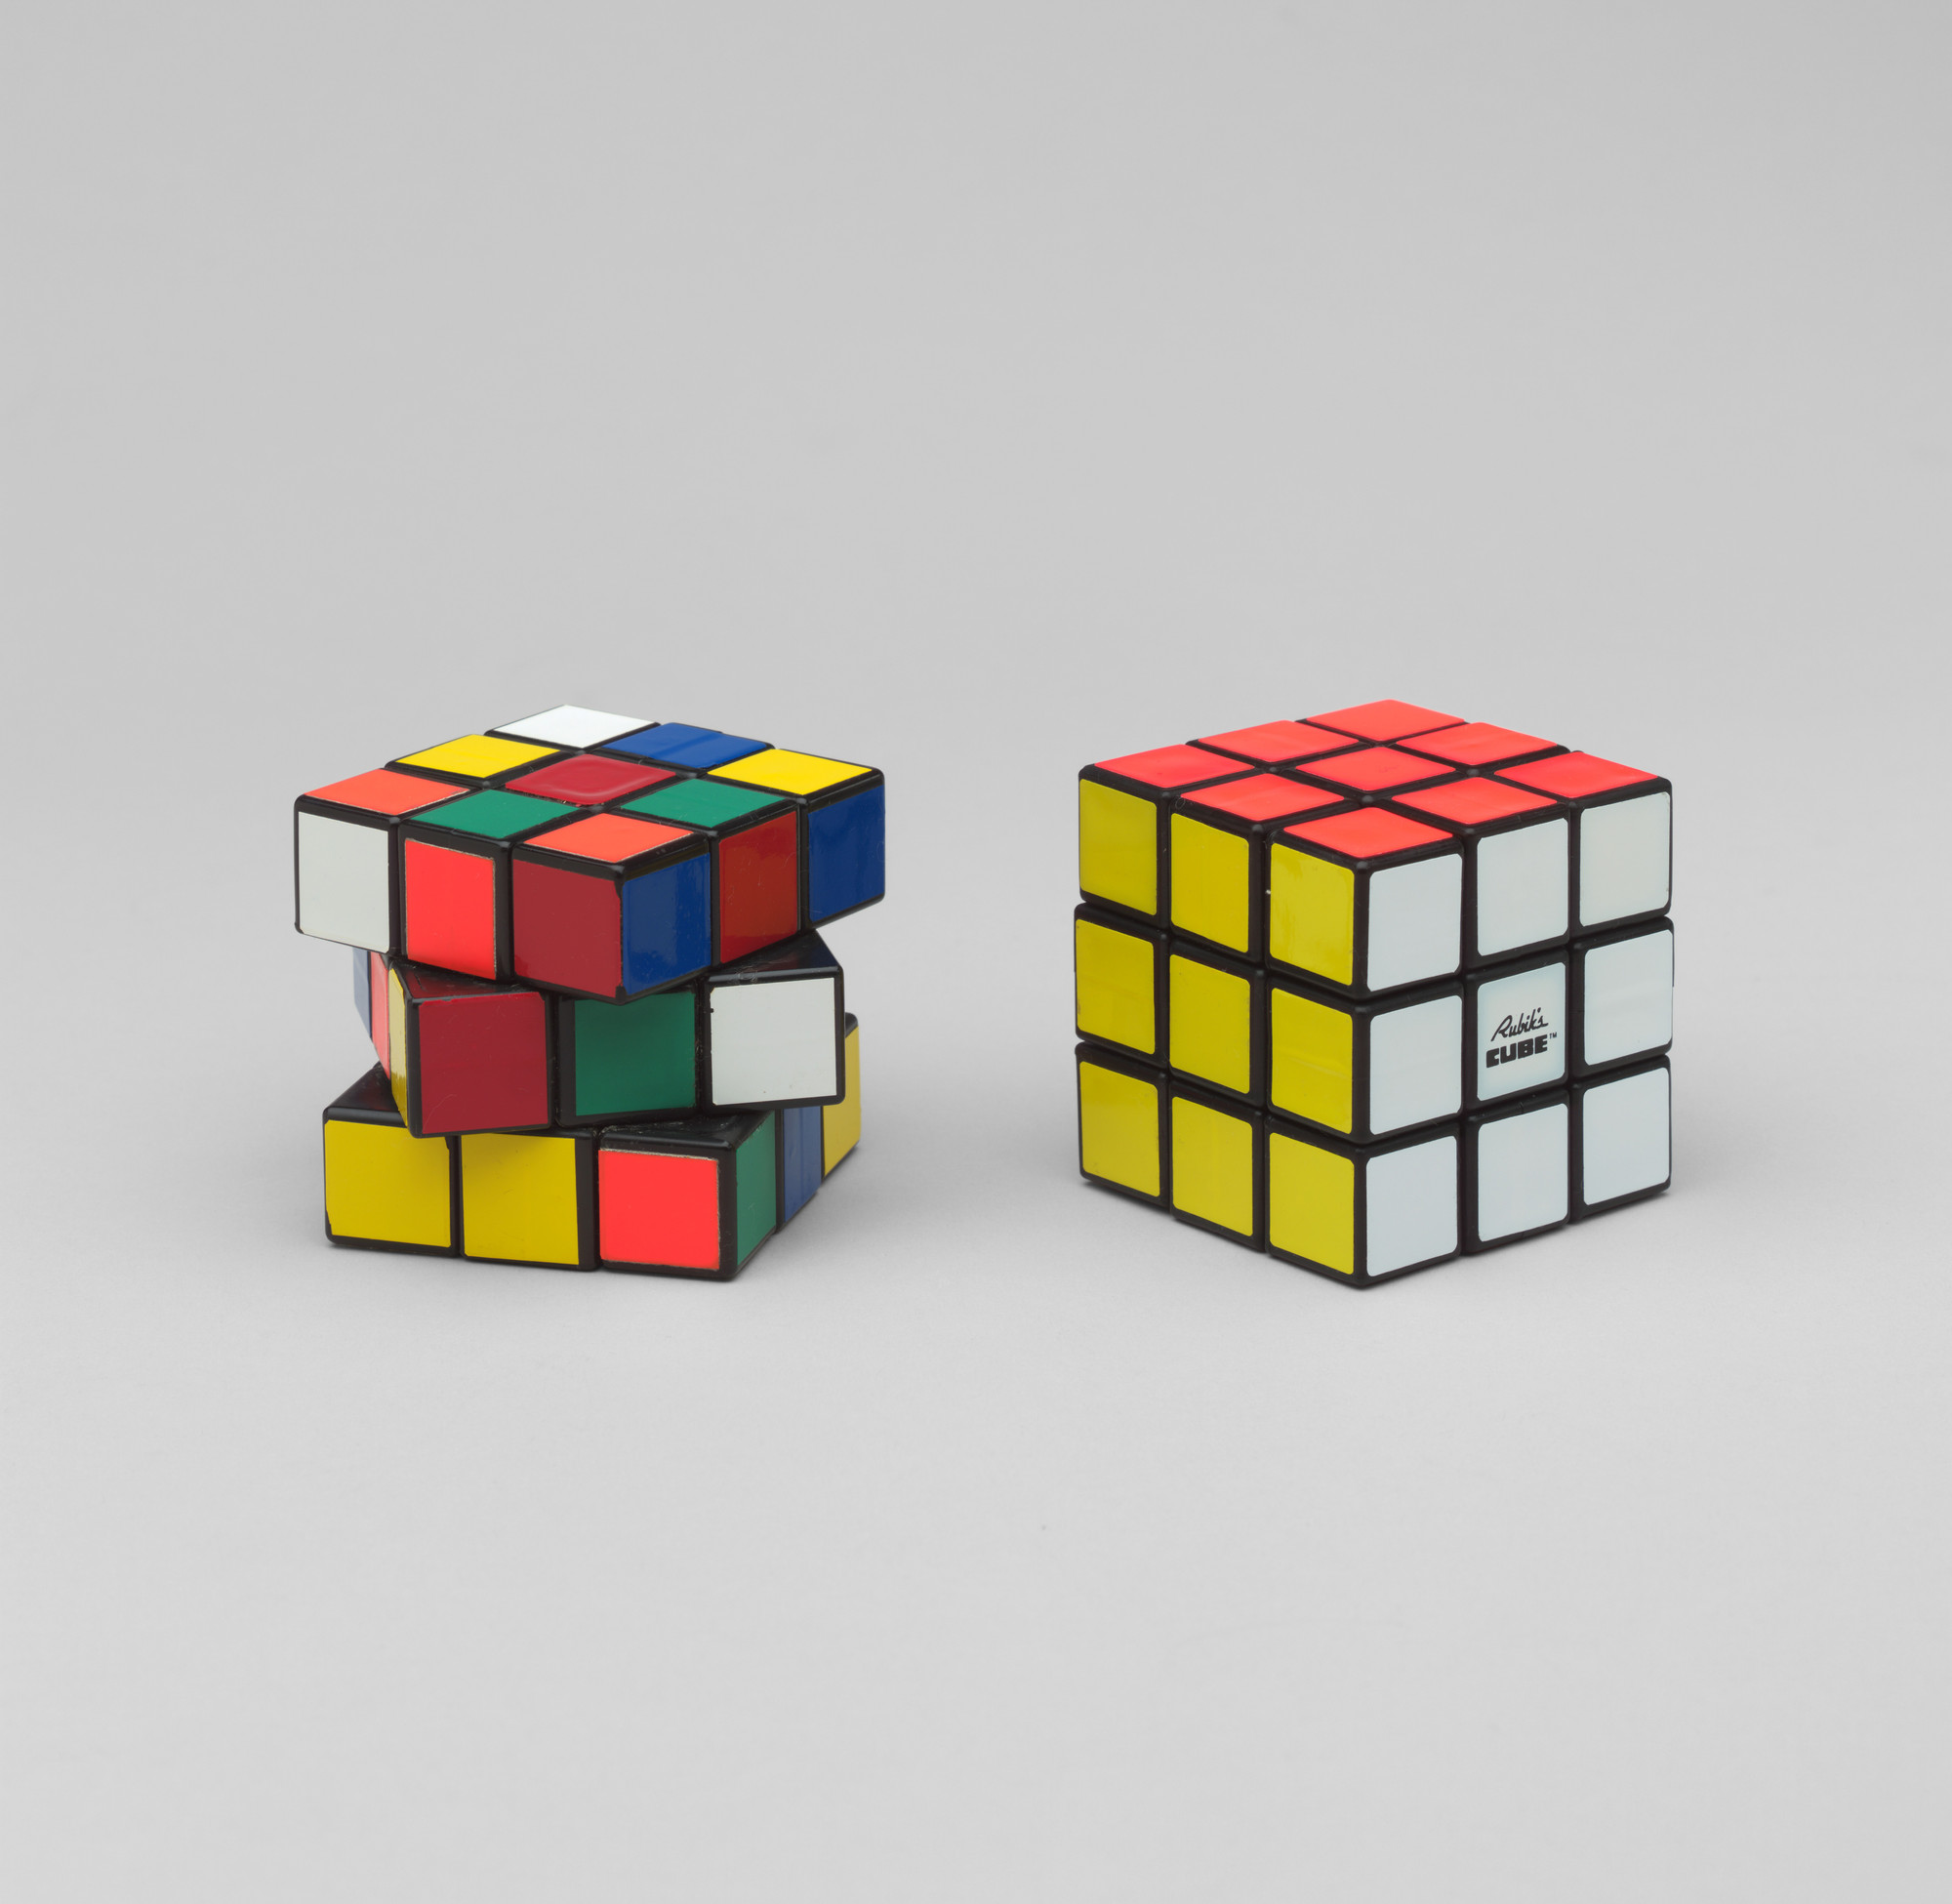 ernö rubik. rubik's cube. 1974 | moma